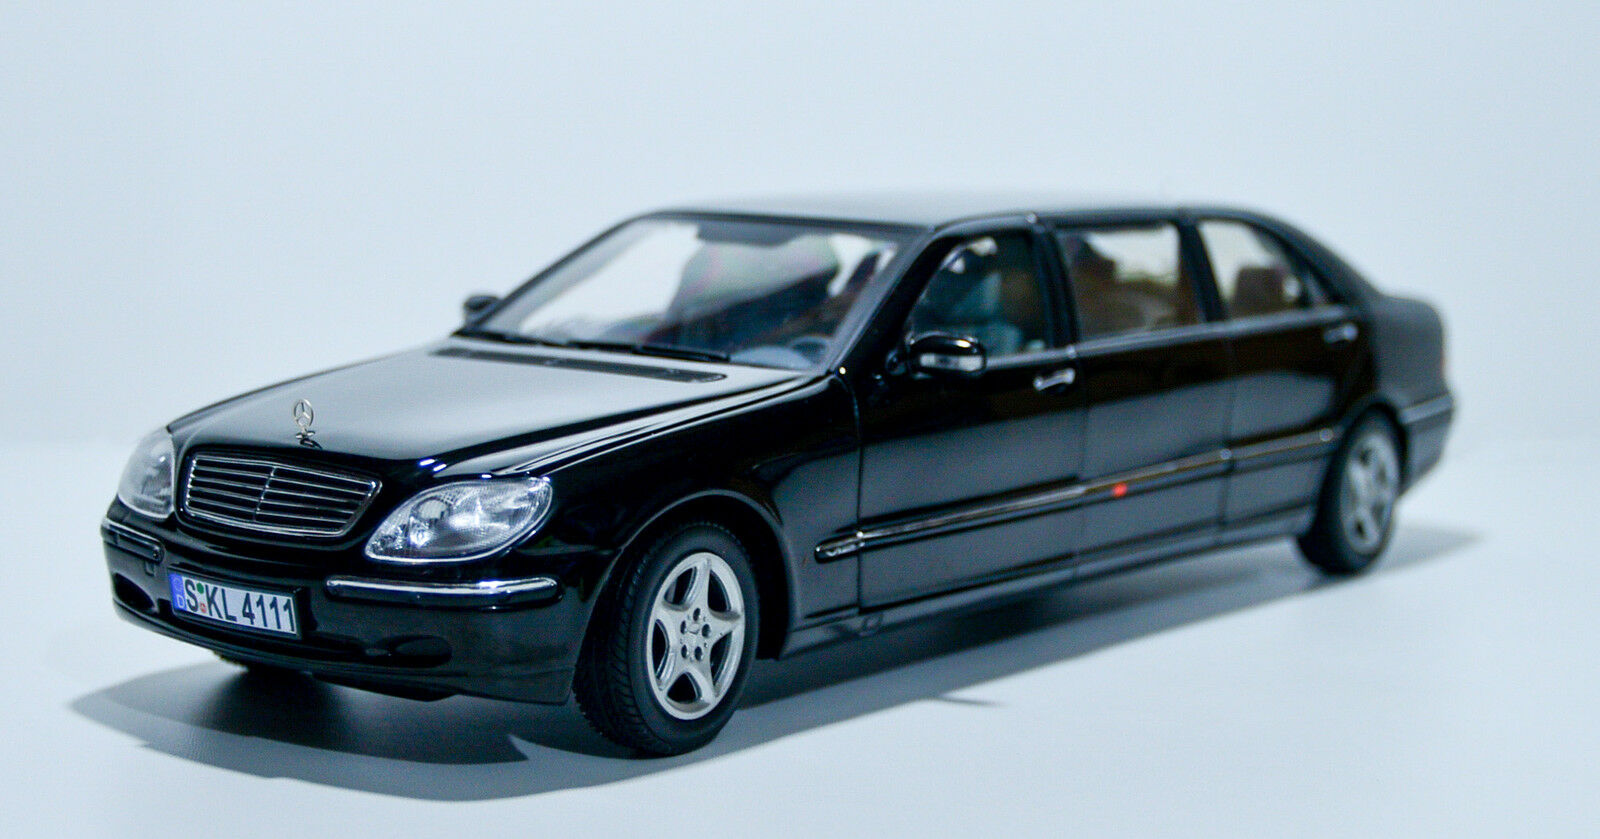 Sunstar Mercedes Benz S Class Pullman diecast car 1 18 NIB Model 4111